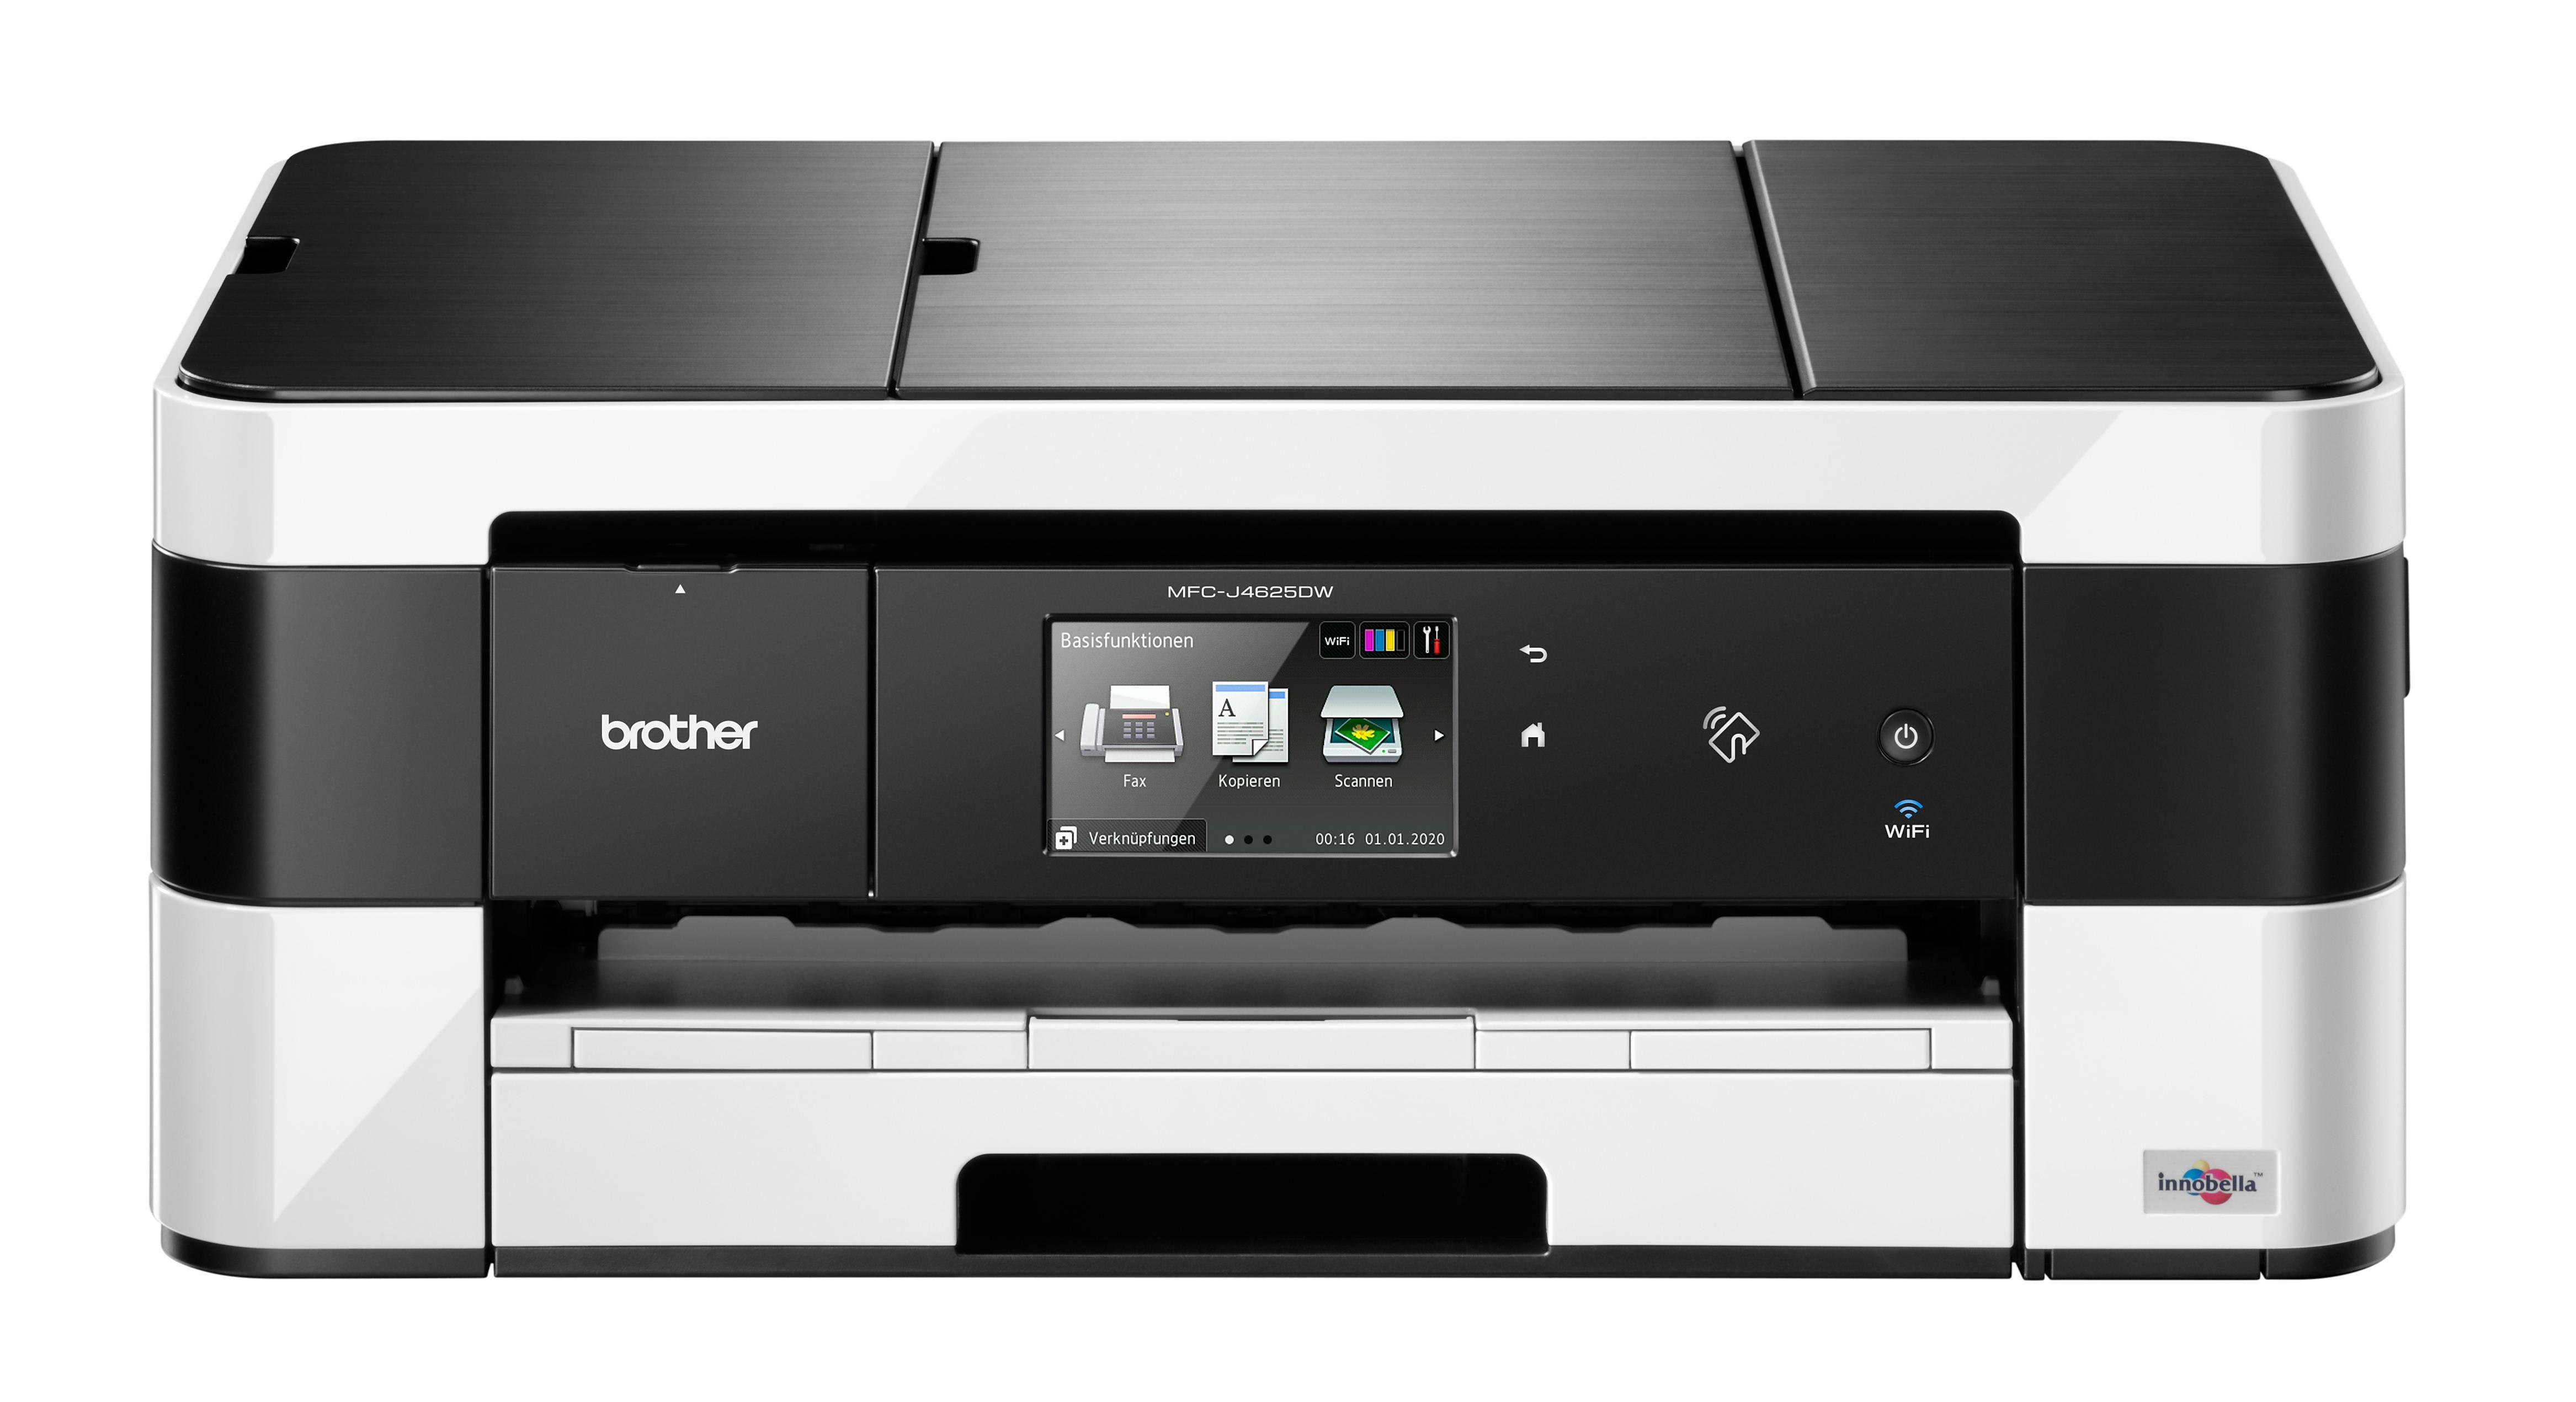 Brother-MFC-J4625DW-A3-Tintenstrahldrucker-Scanner